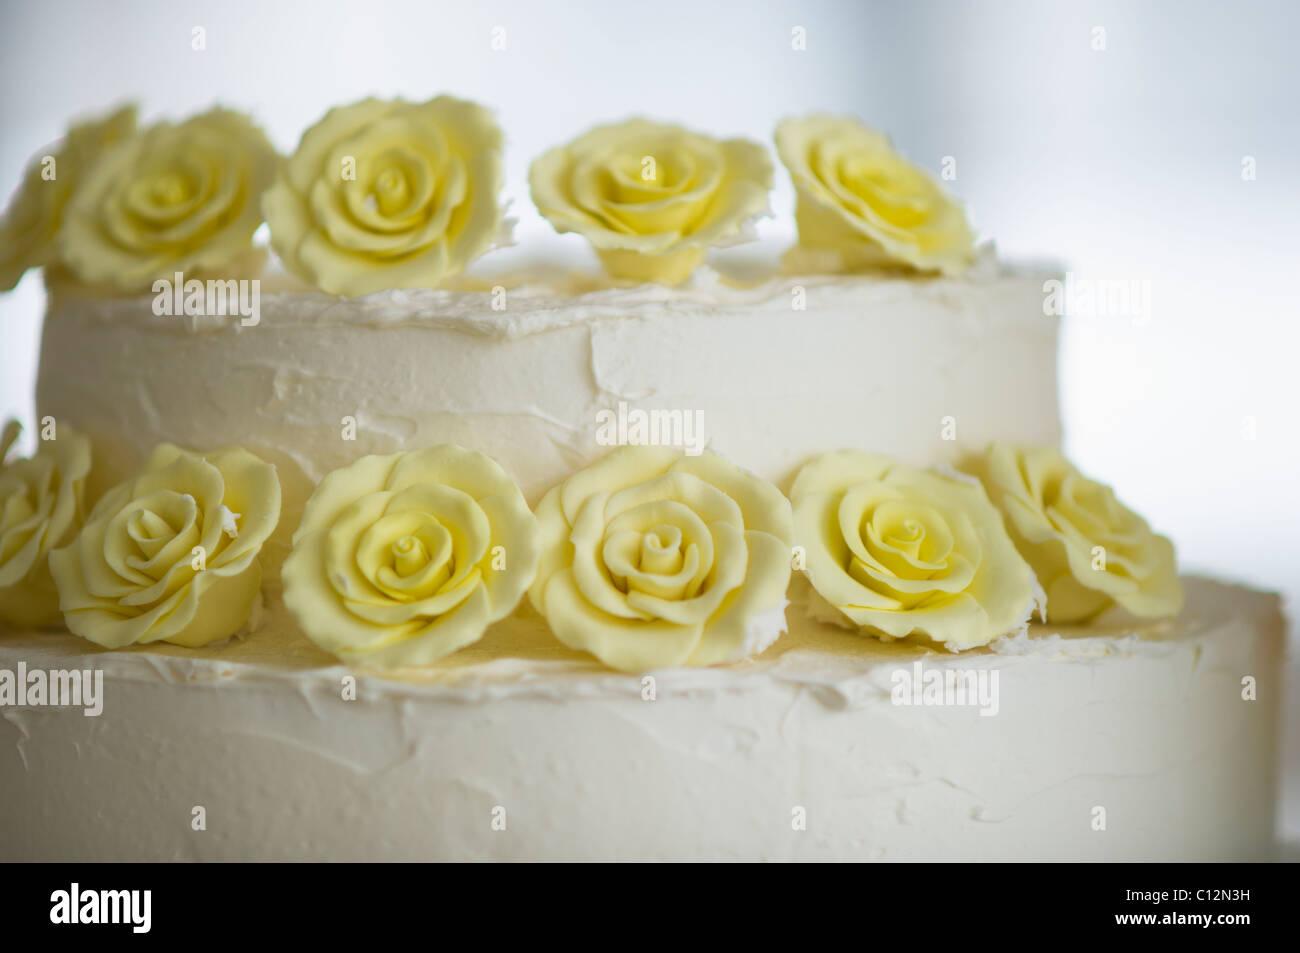 USA, New Jersey, Jersey City, Close-up on wedding cake decorated ...